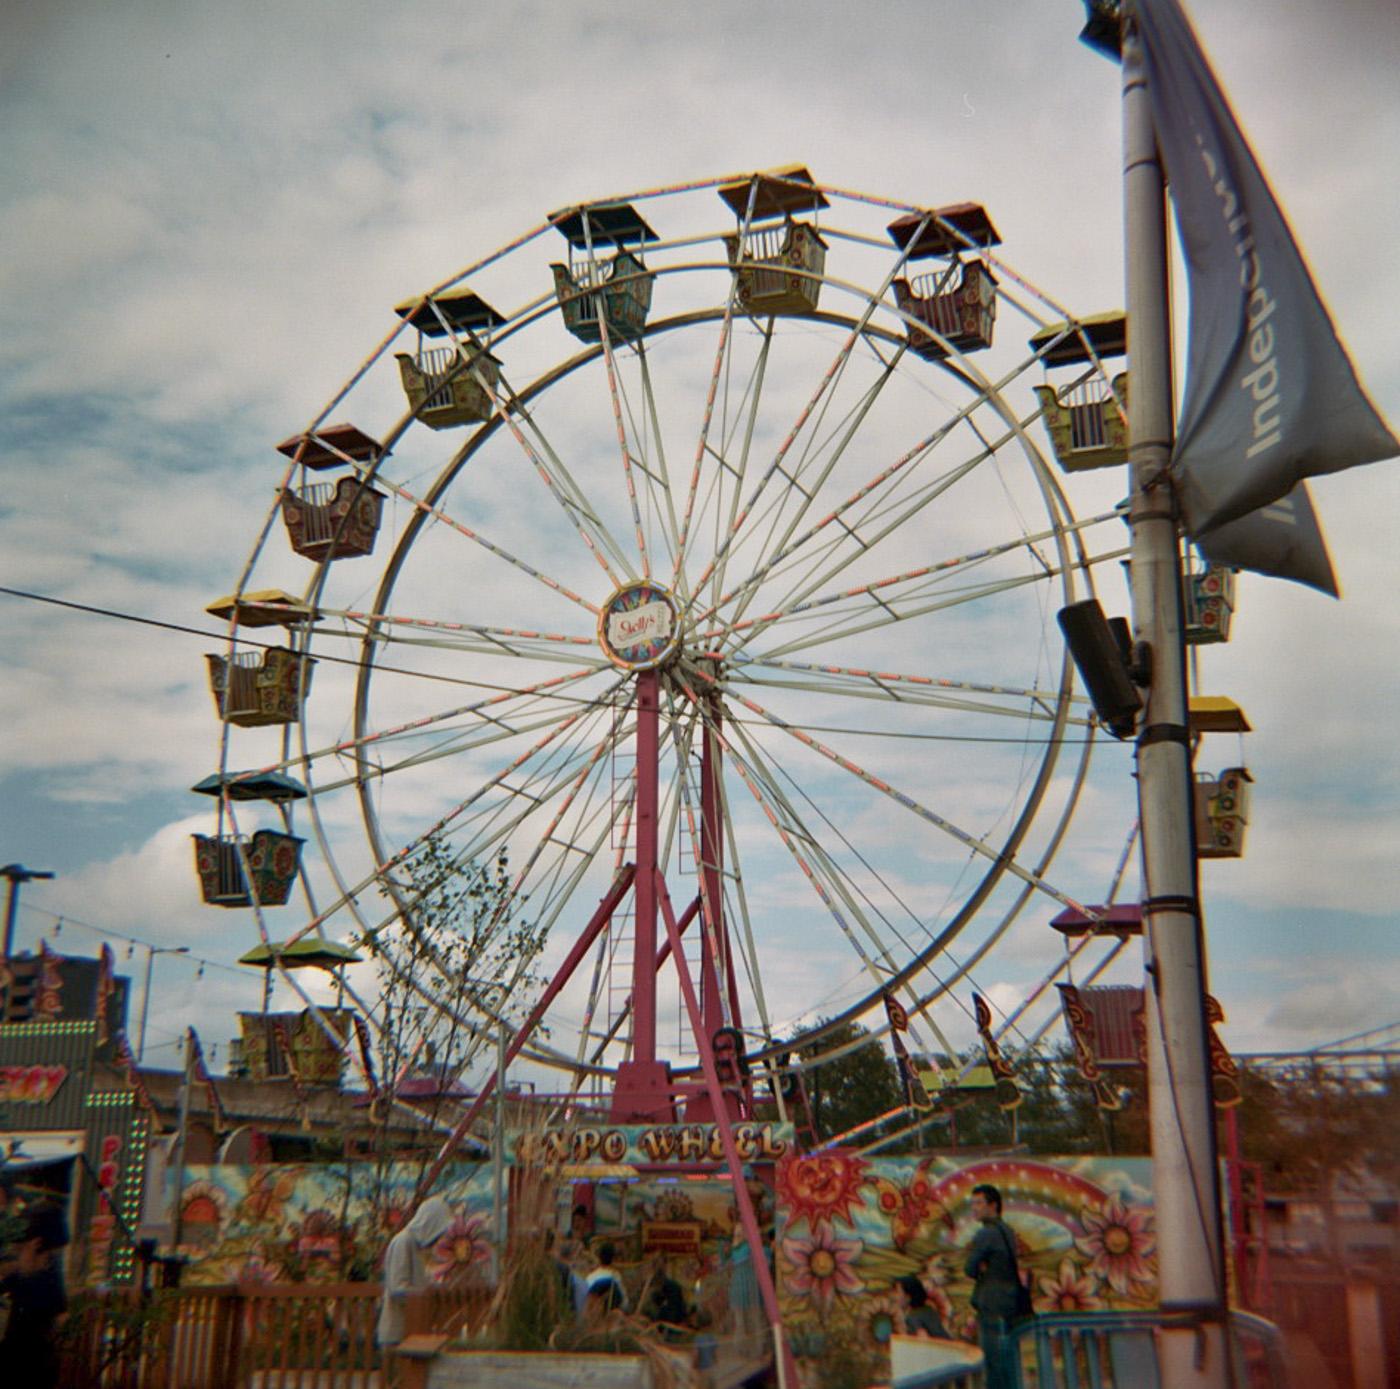 Ferris Wheel at Summerfest